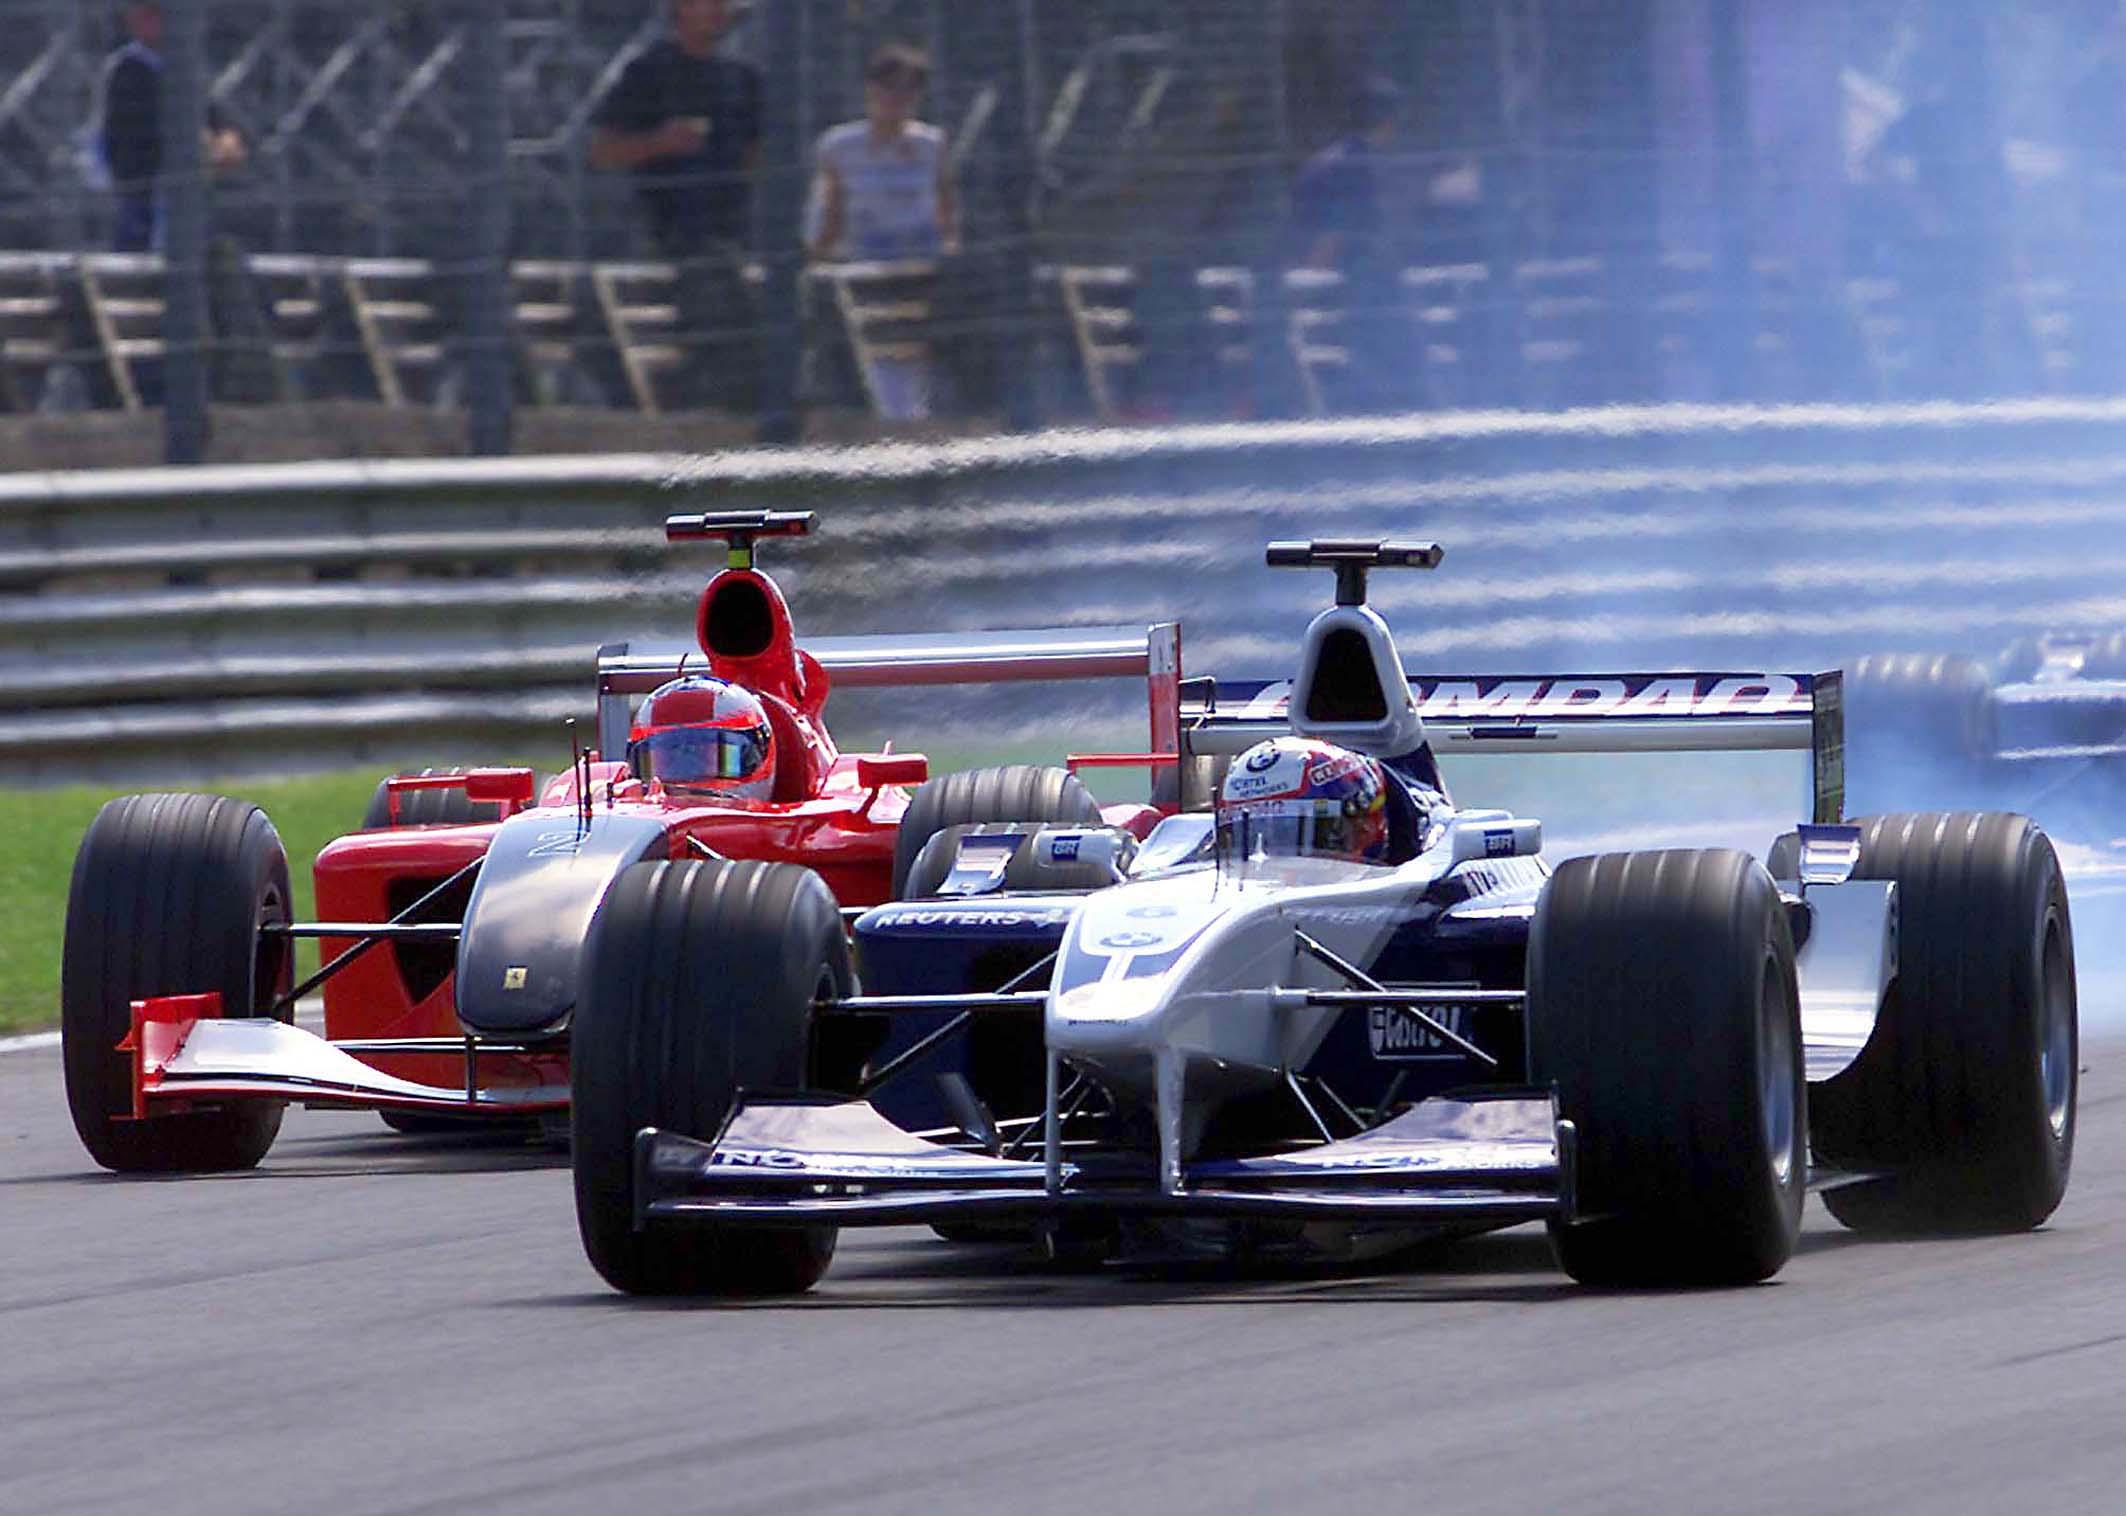 Juan Pablo Montoya Williams Italian Grand Prix 2001 Monza